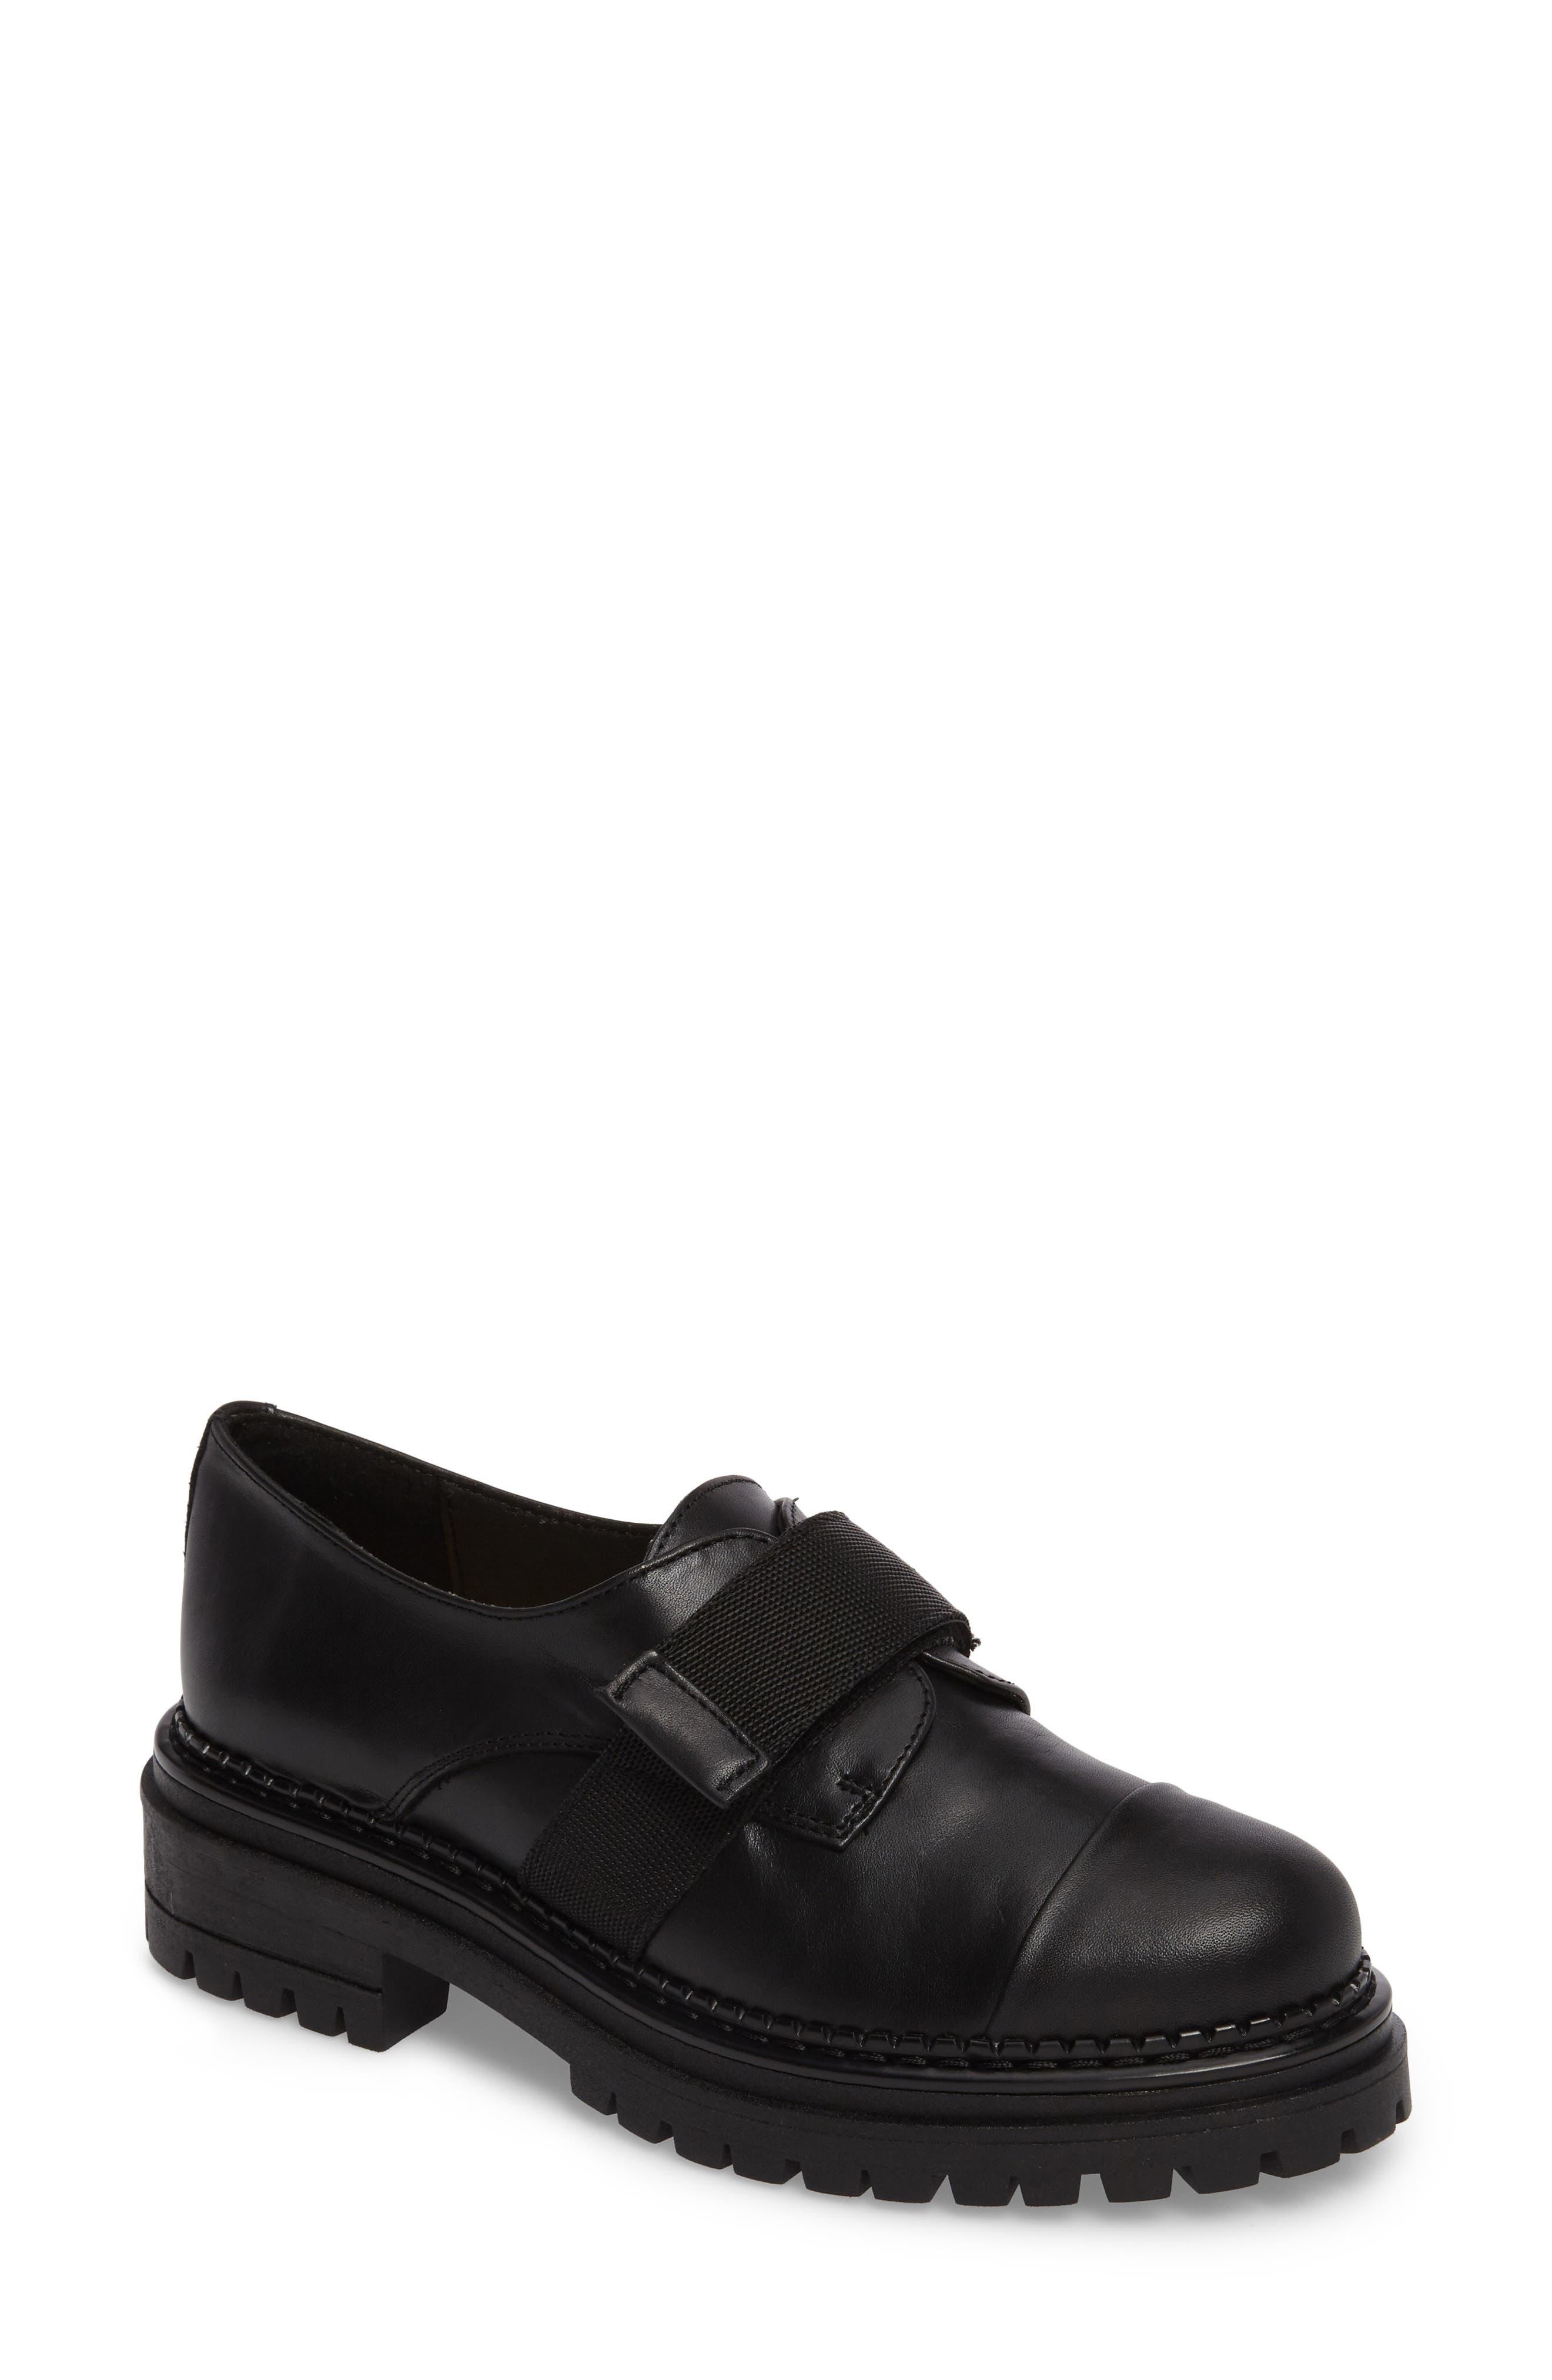 Keeper Lug Sole Loafer,                             Main thumbnail 1, color,                             Black